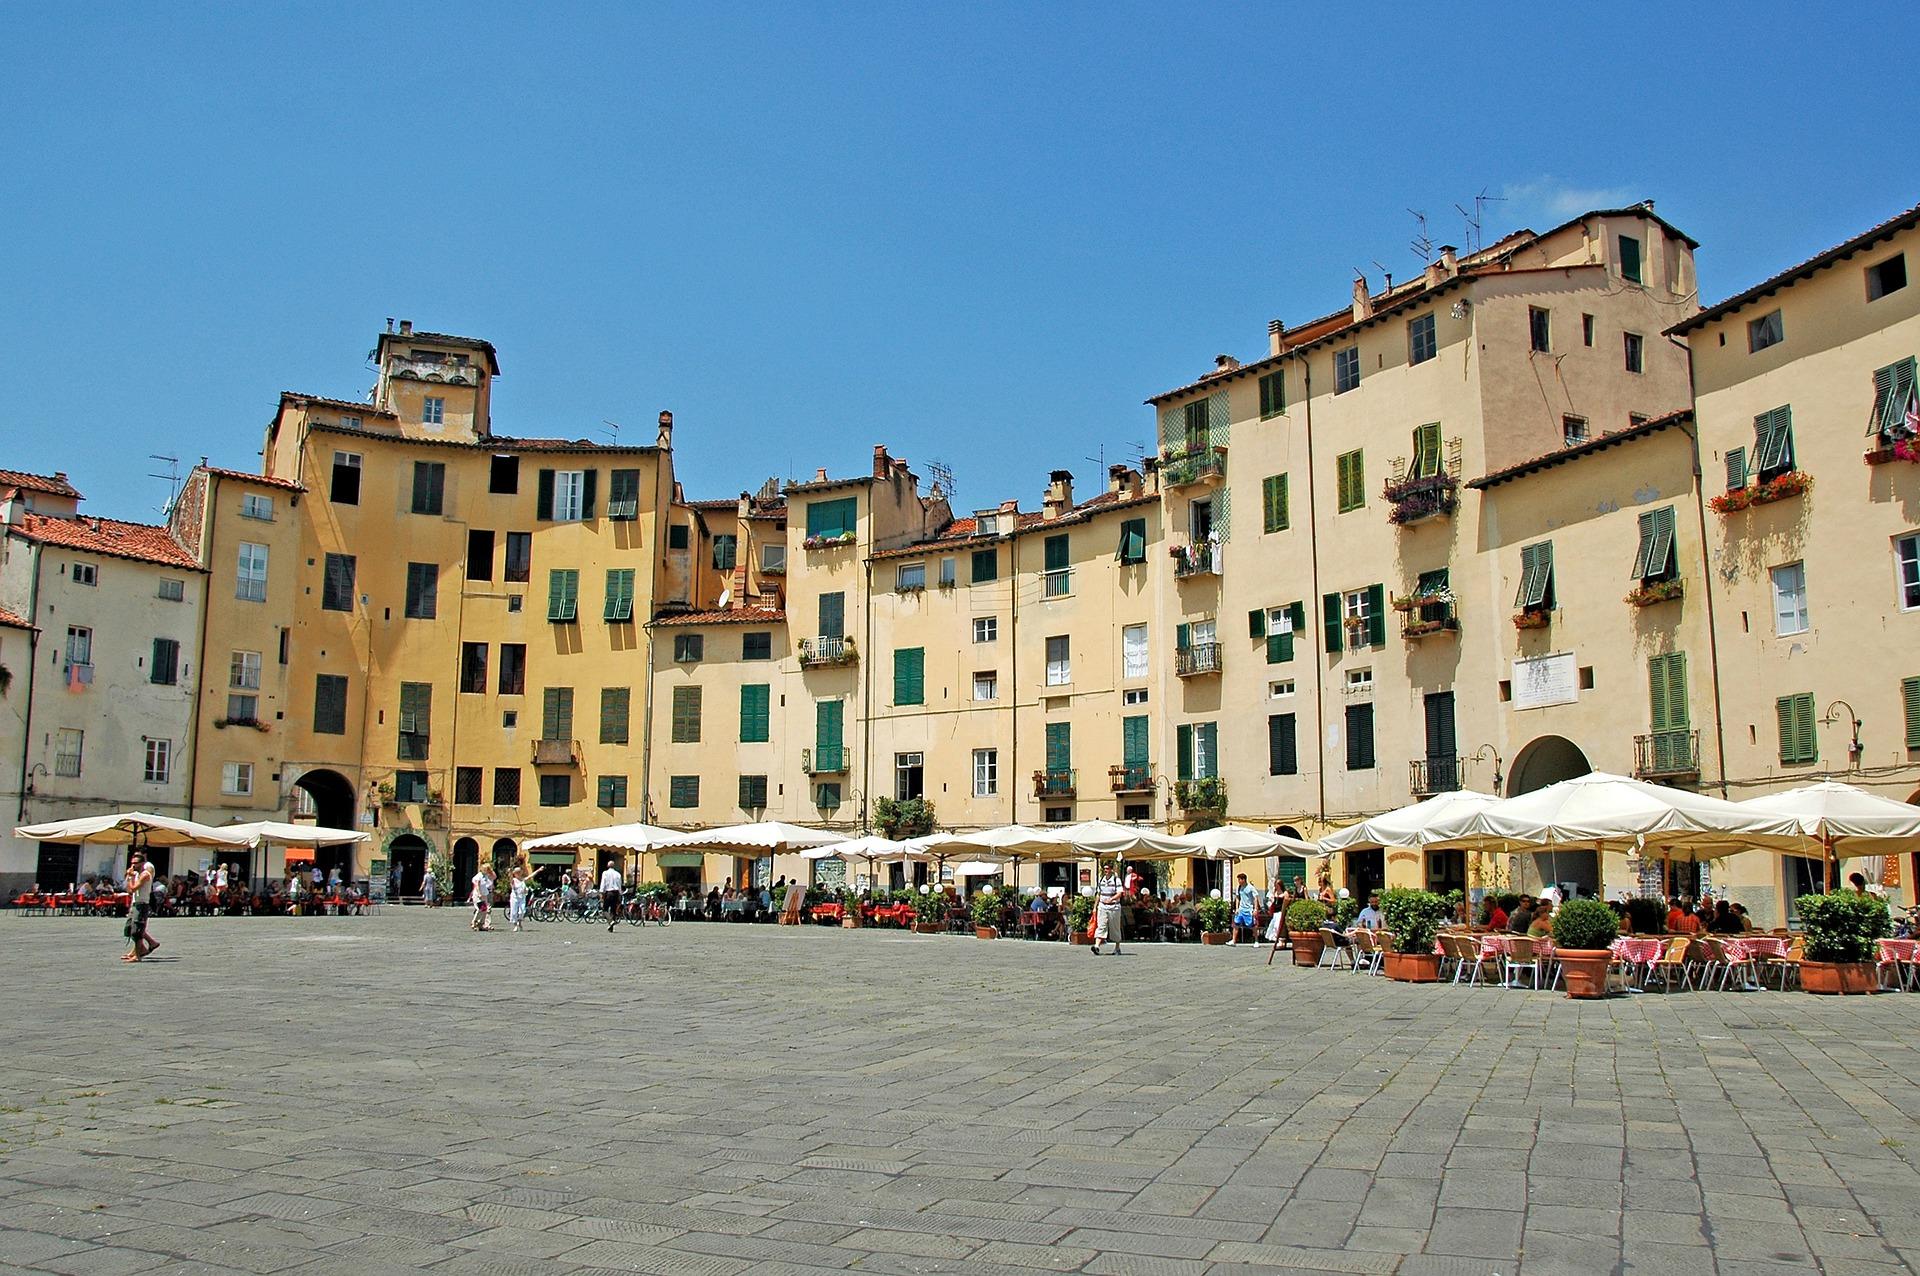 2. Lucca